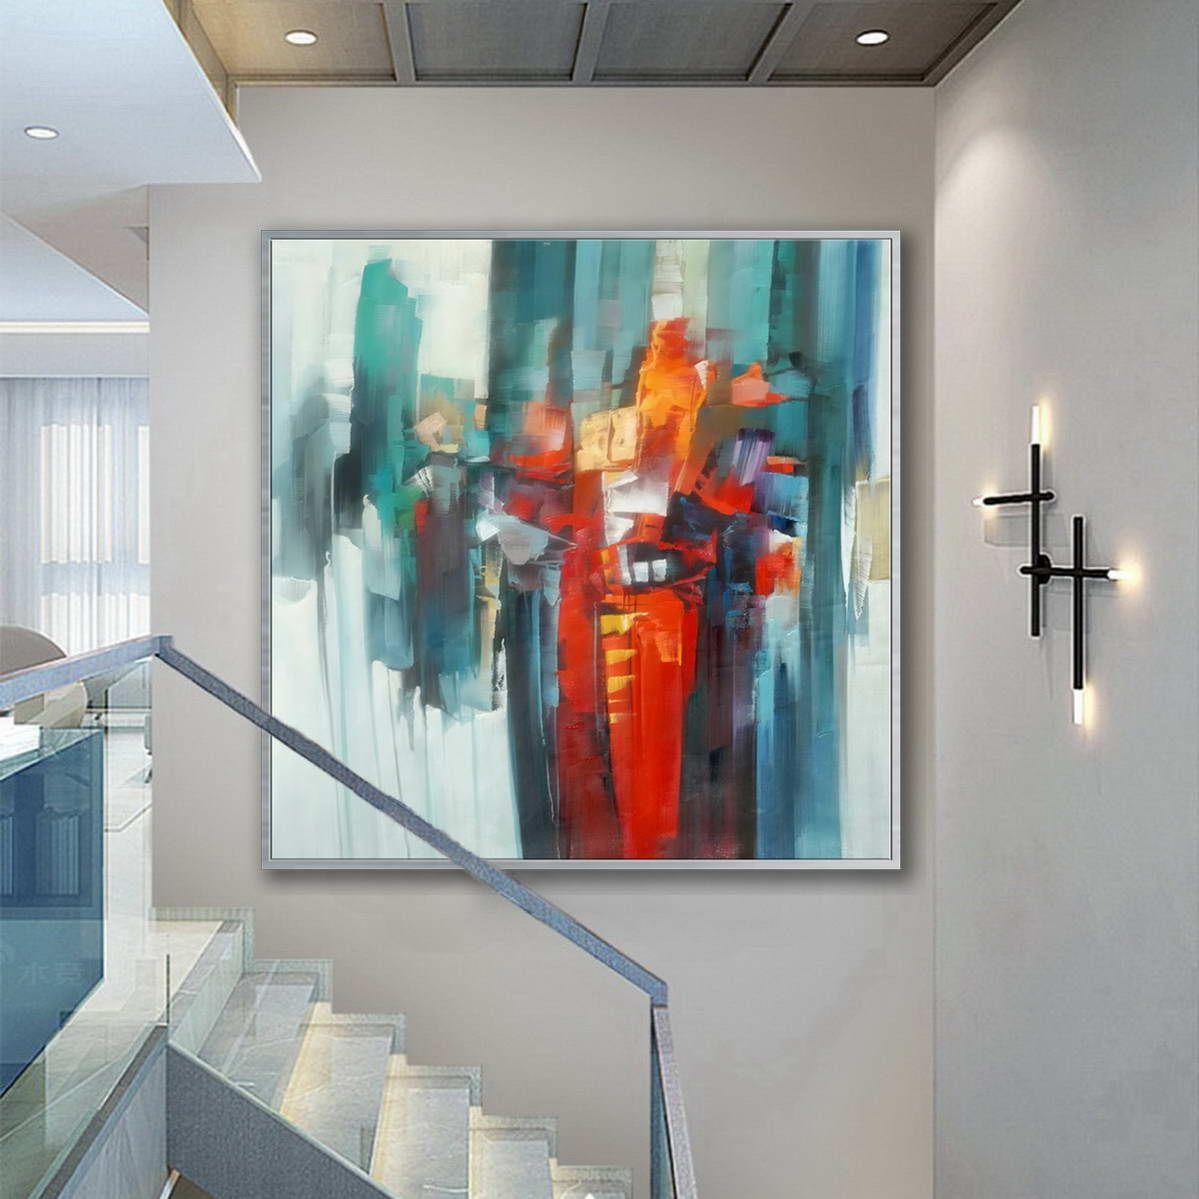 Bright Color Brush Strokes Contemporary Artwork Extra Large Square